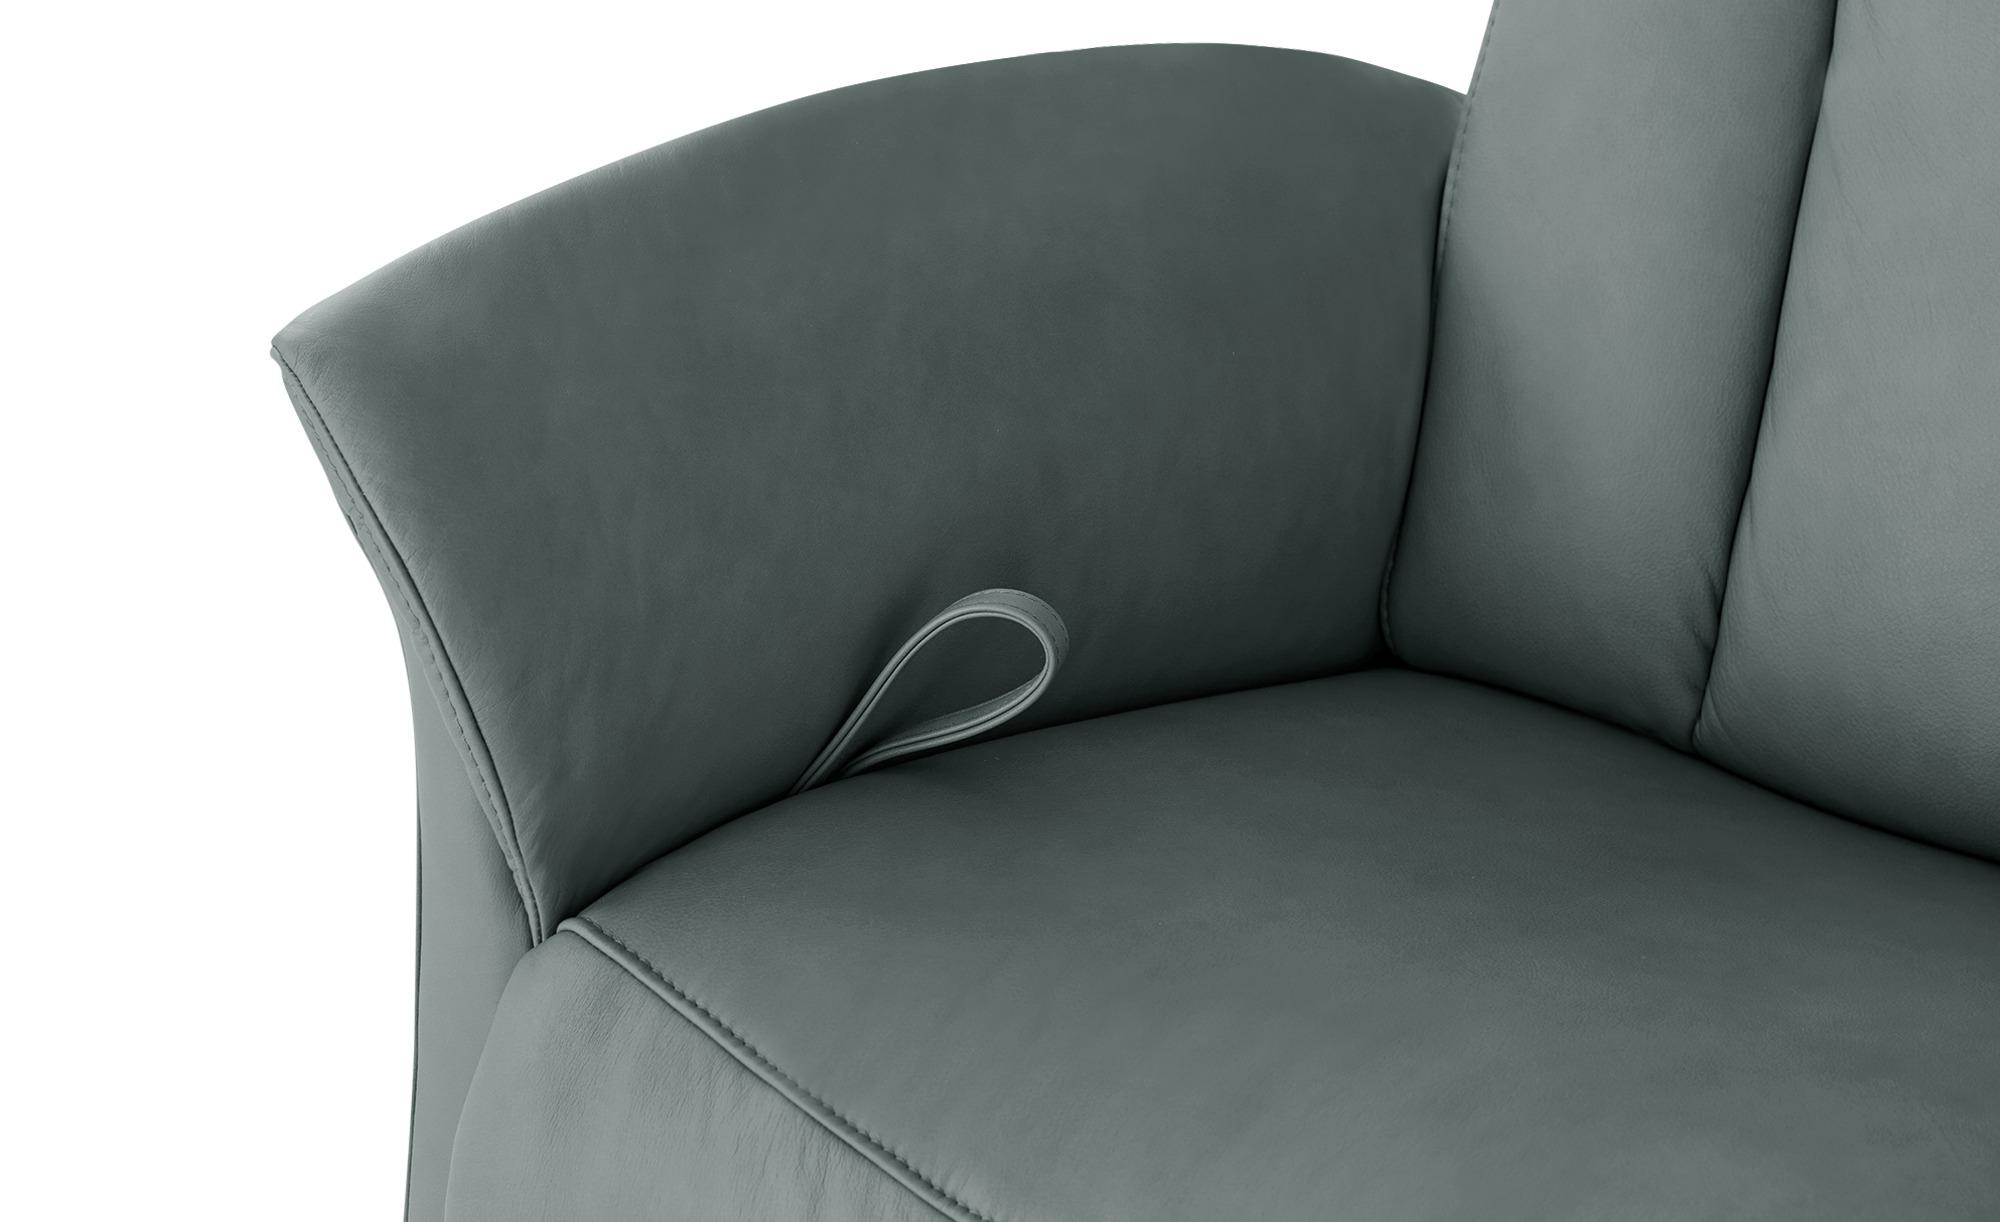 himolla Sessel mit Relaxfunktion  4010 ¦ grau ¦ Maße (cm): B: 87 H: 108 T: 88 Polstermöbel > Sessel > Ledersessel - Höffner